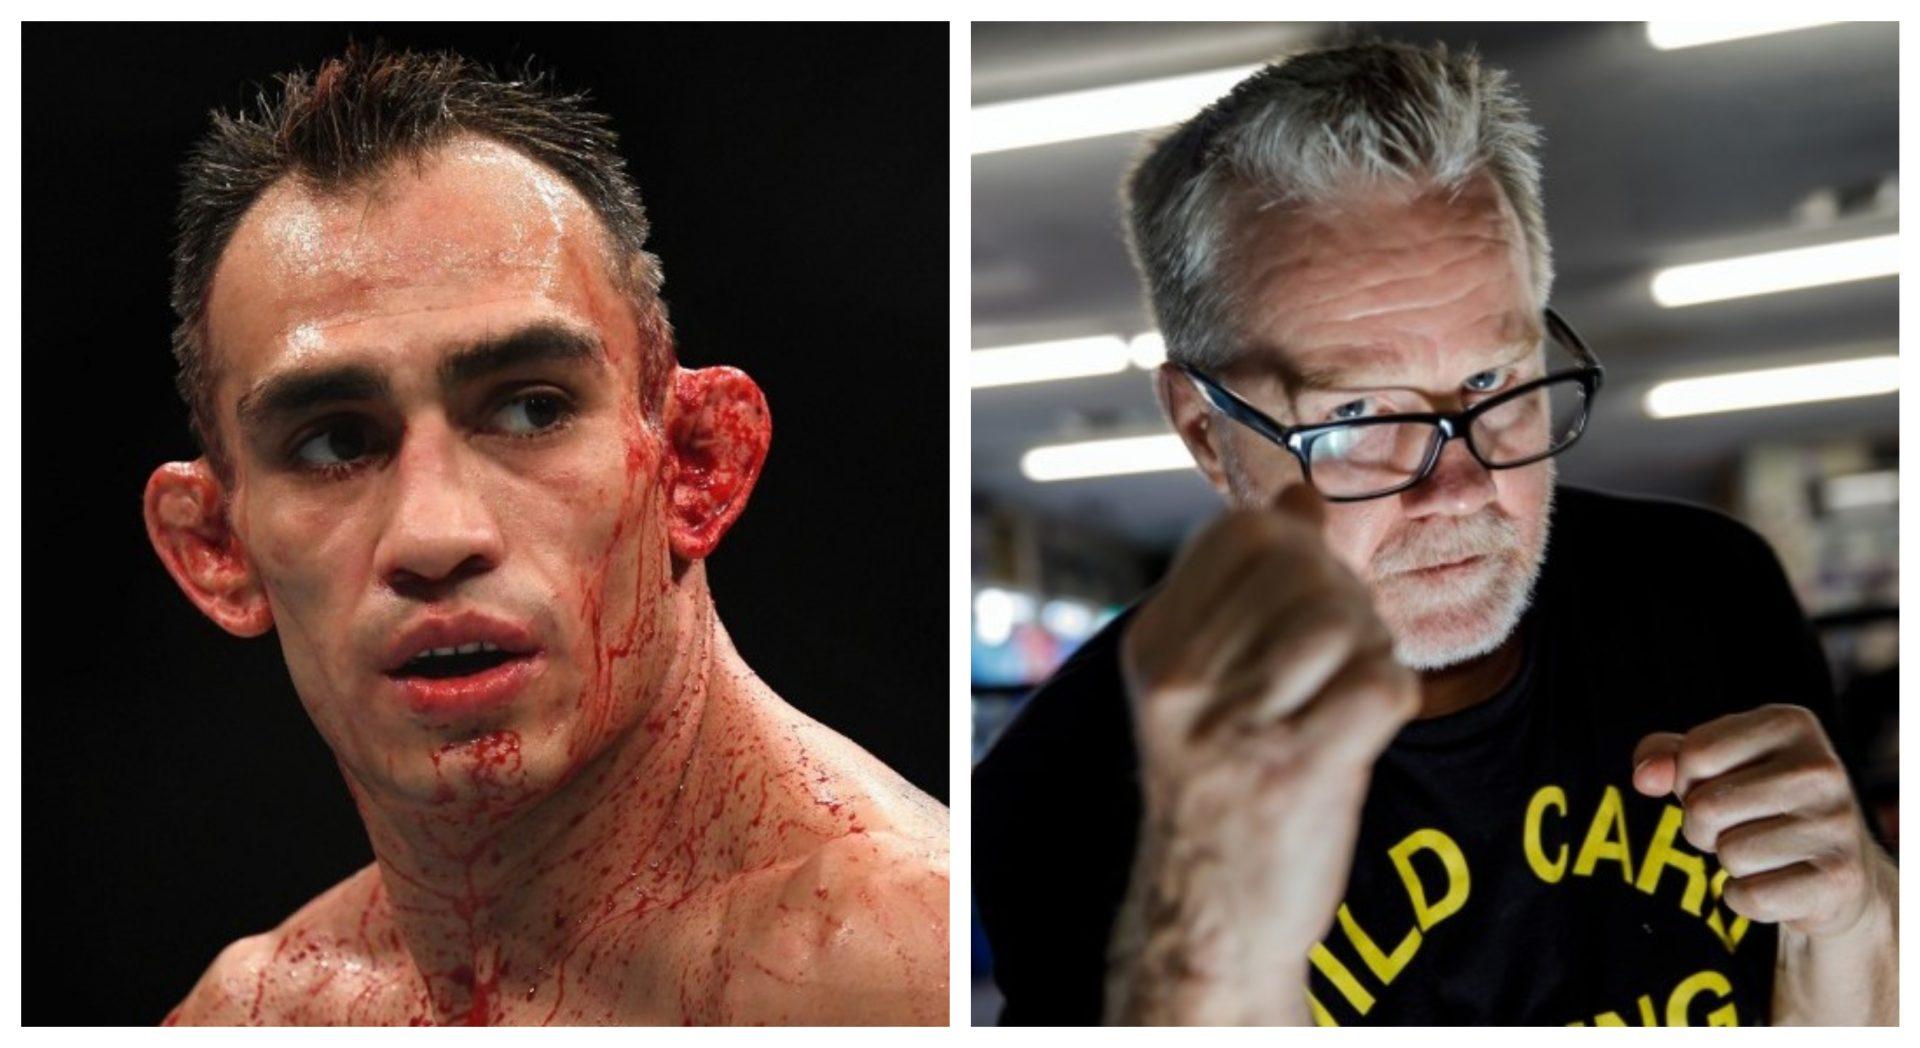 Tony Ferguson details his newfound alliance with legendary boxing coach Freddie Roach - Ferguson